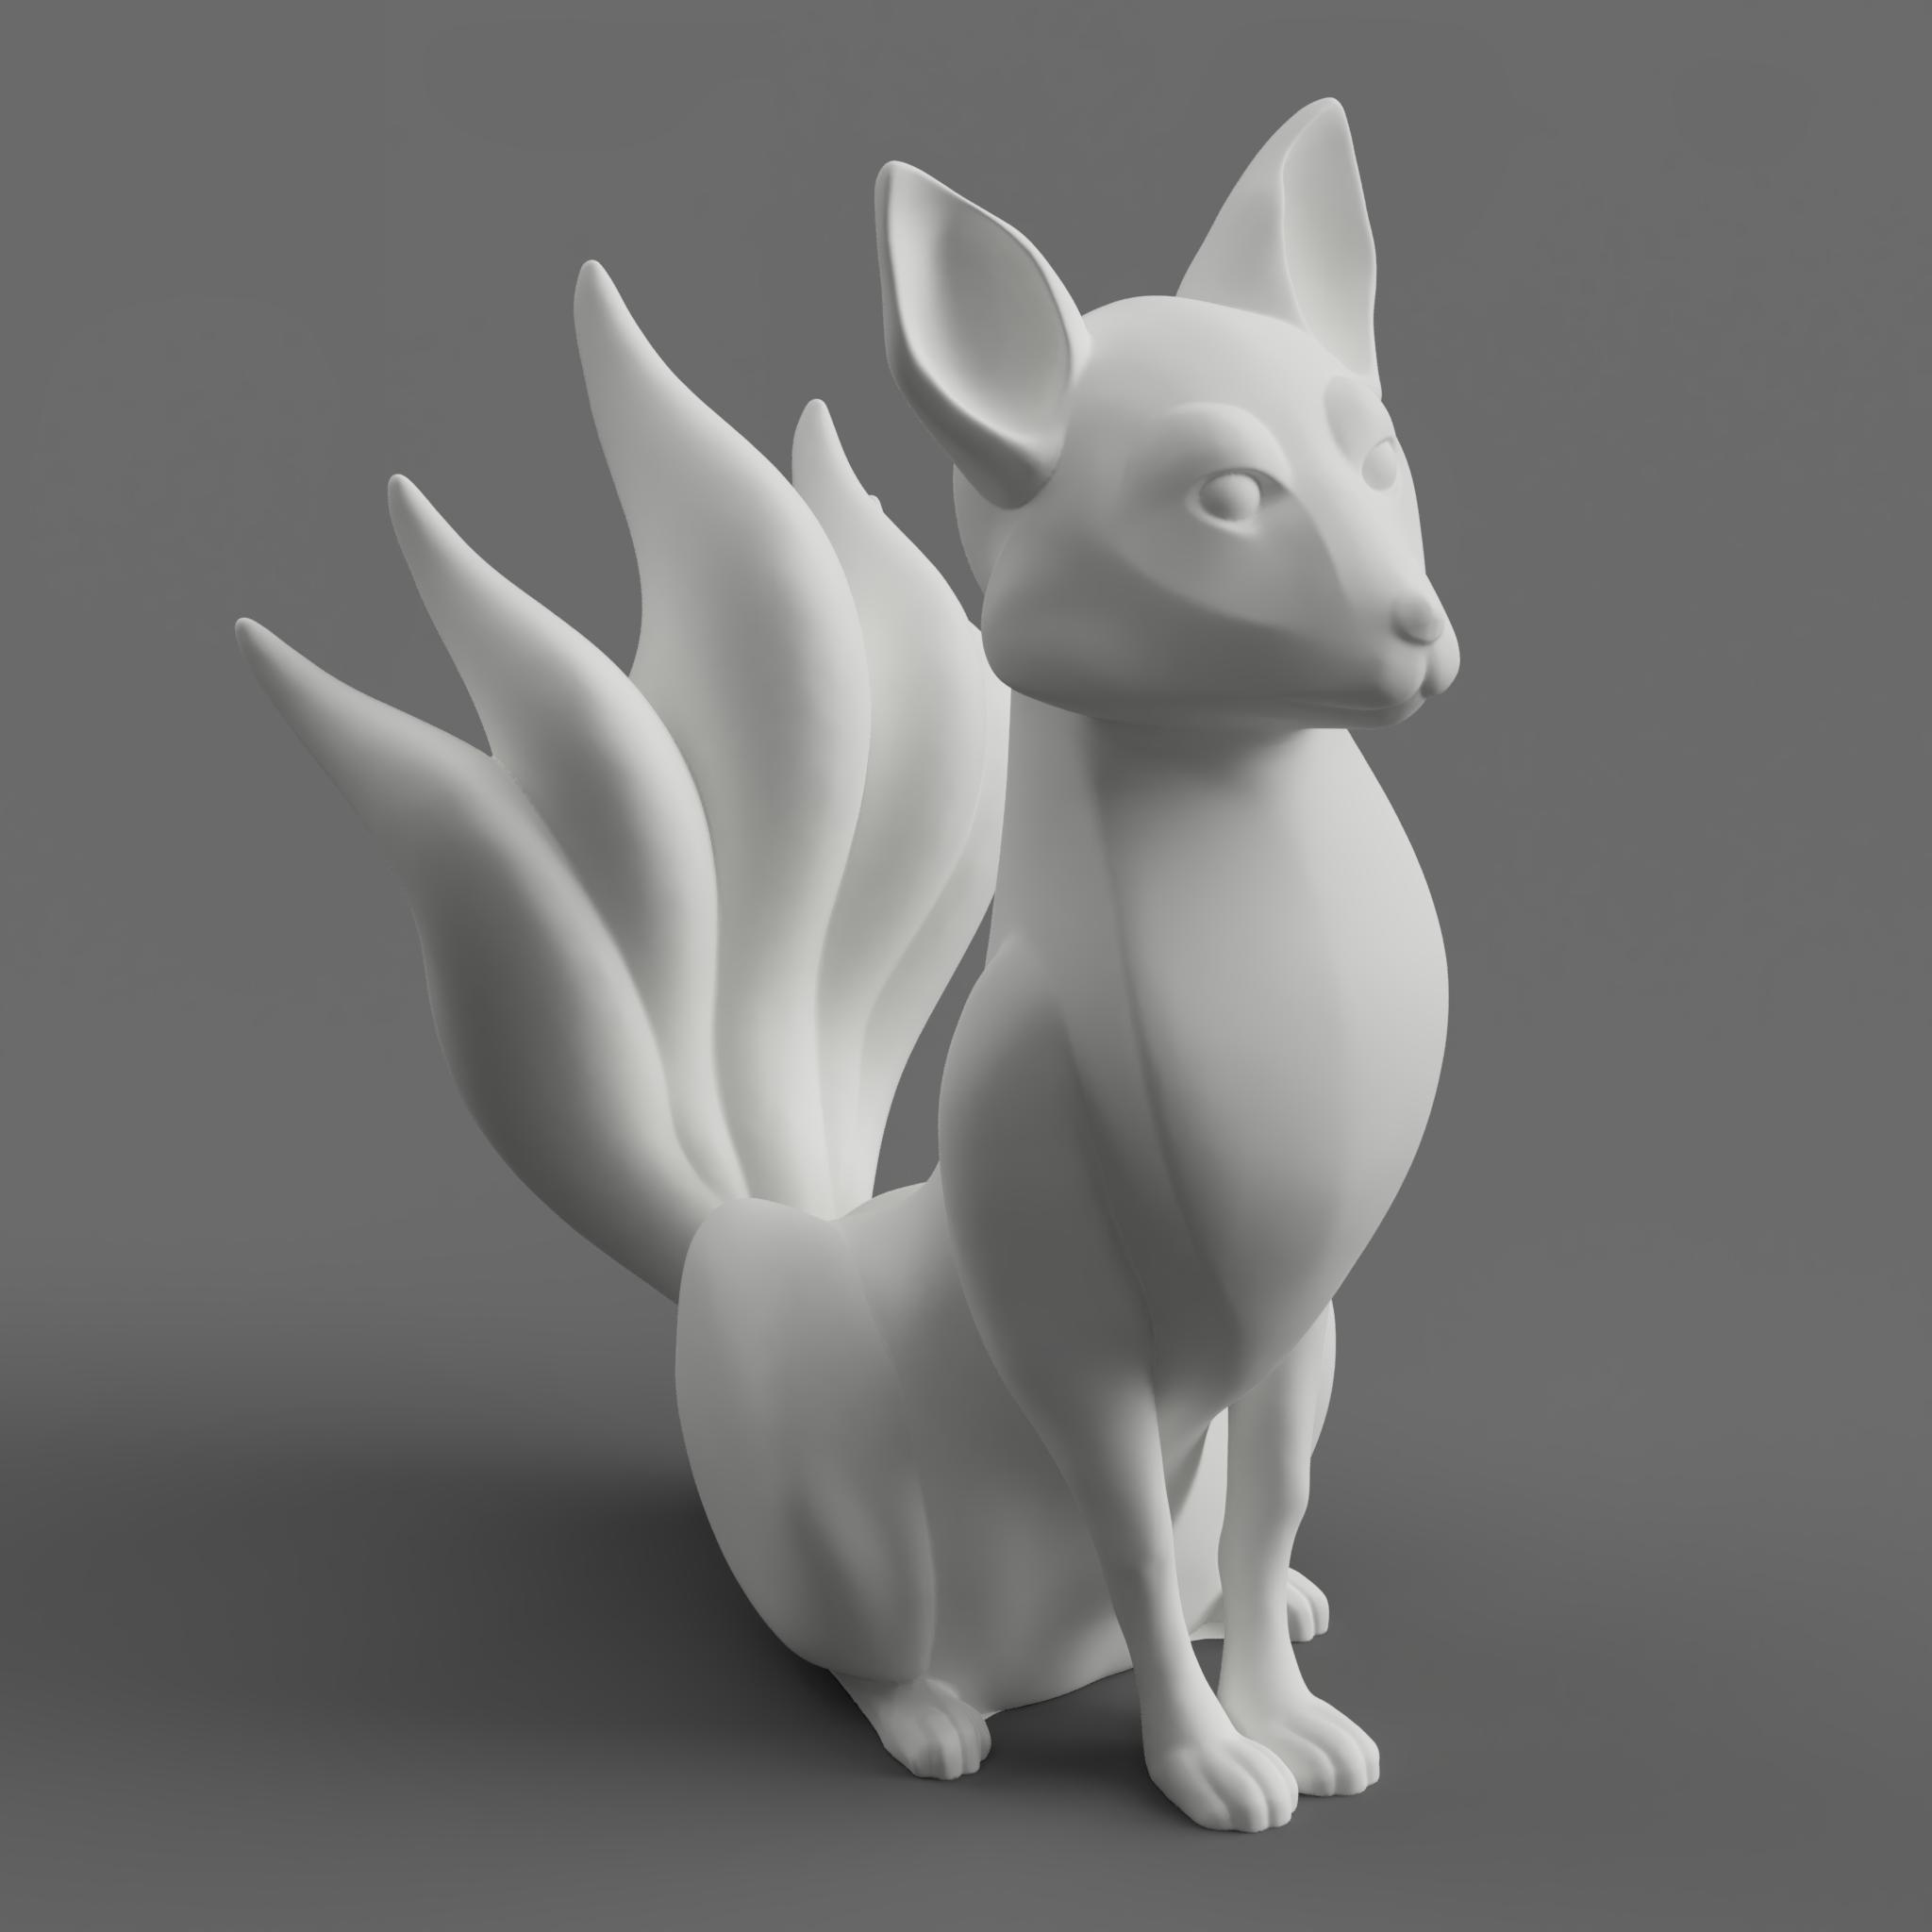 TJG_Kitsune01.png Download free STL file Kitsune - Easy Print, no supports required. New V3!!! • Design to 3D print, ThatJoshGuy